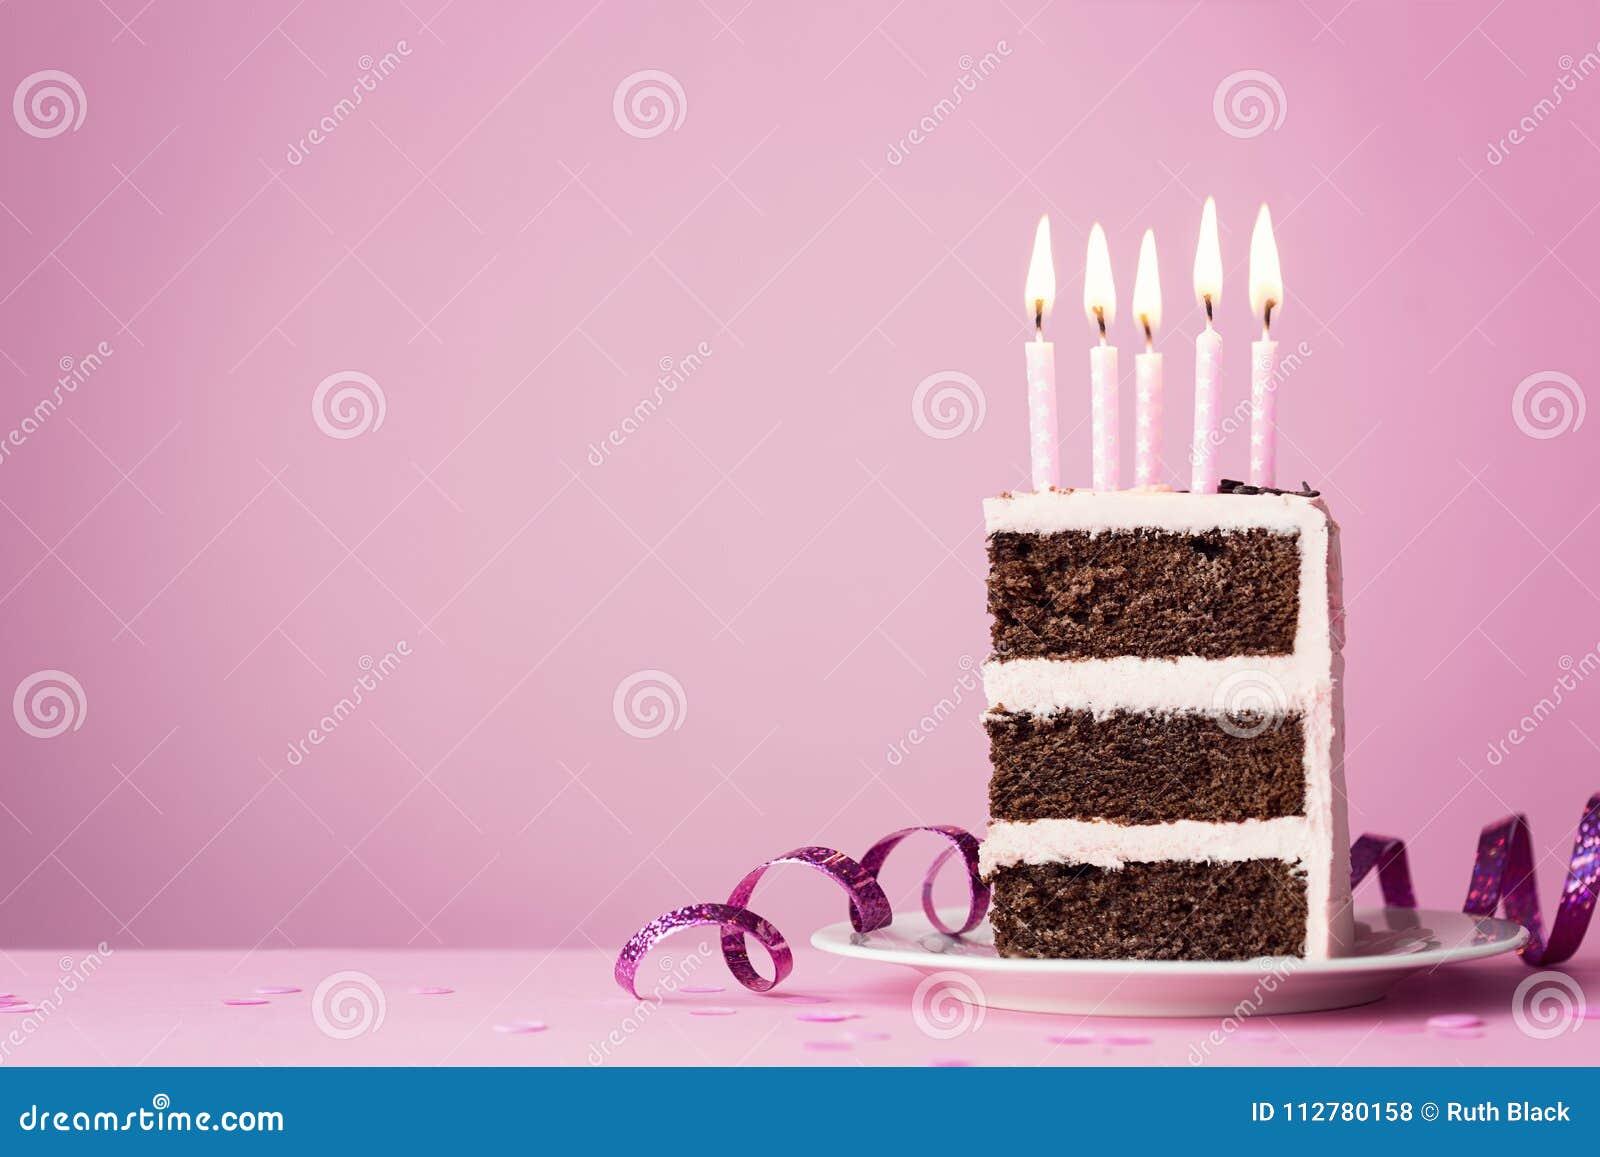 Chokladfödelsedagkaka med rosa stearinljus